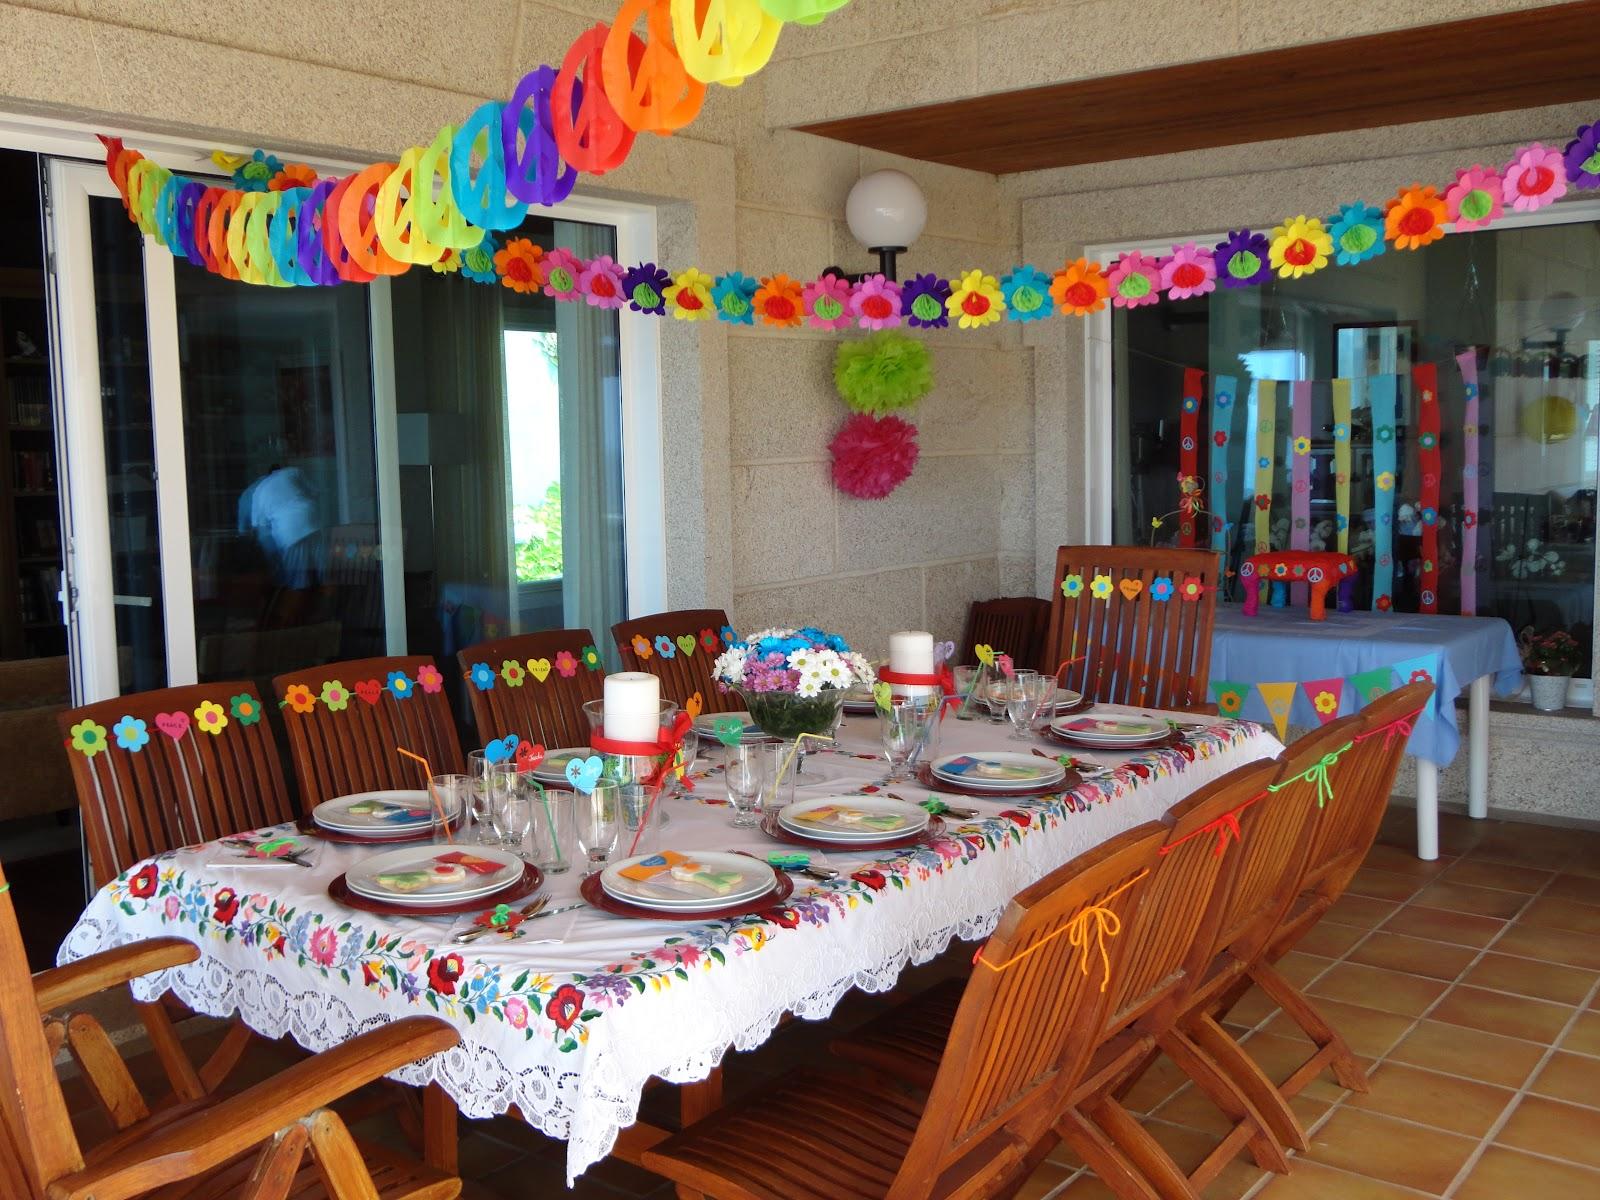 Celebra con ana compartiendo experiencias creativas for Decoracion 70 s